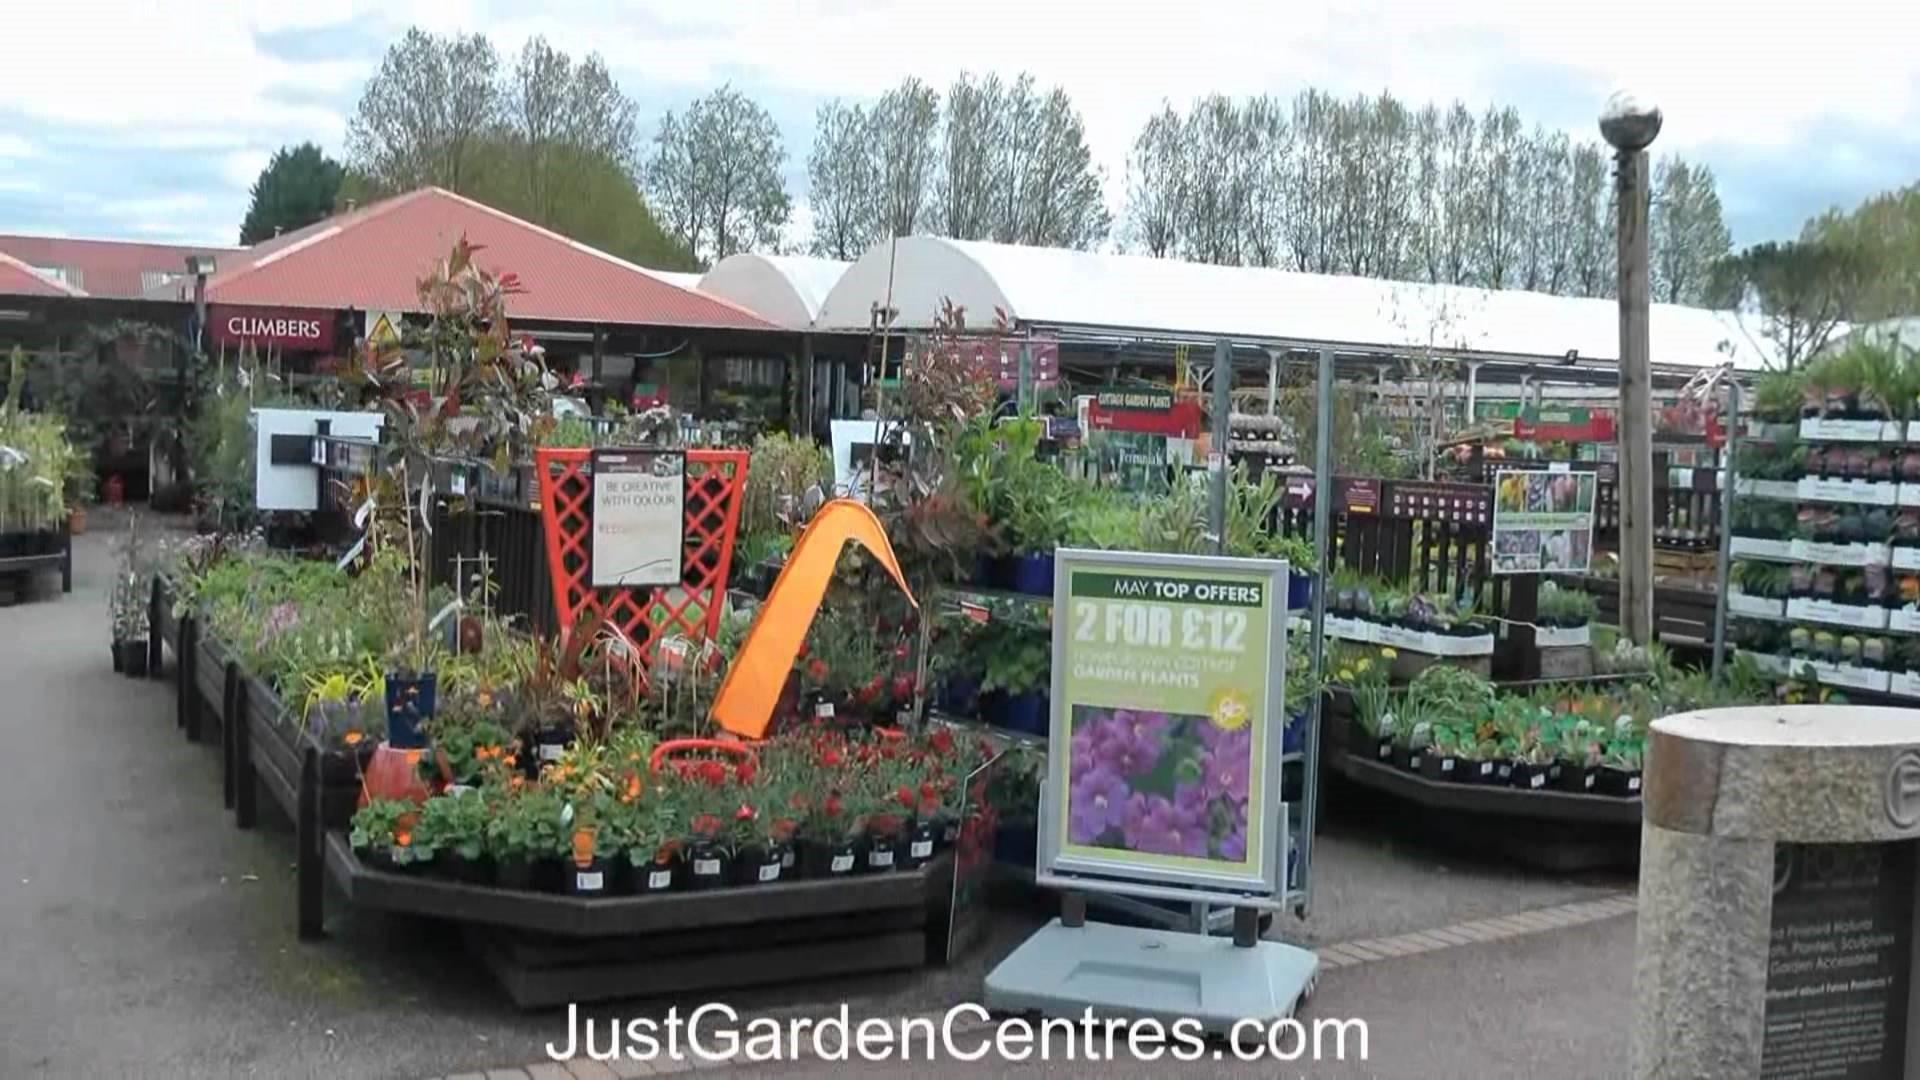 Squires Garden Centre at Badshot Lea- 1